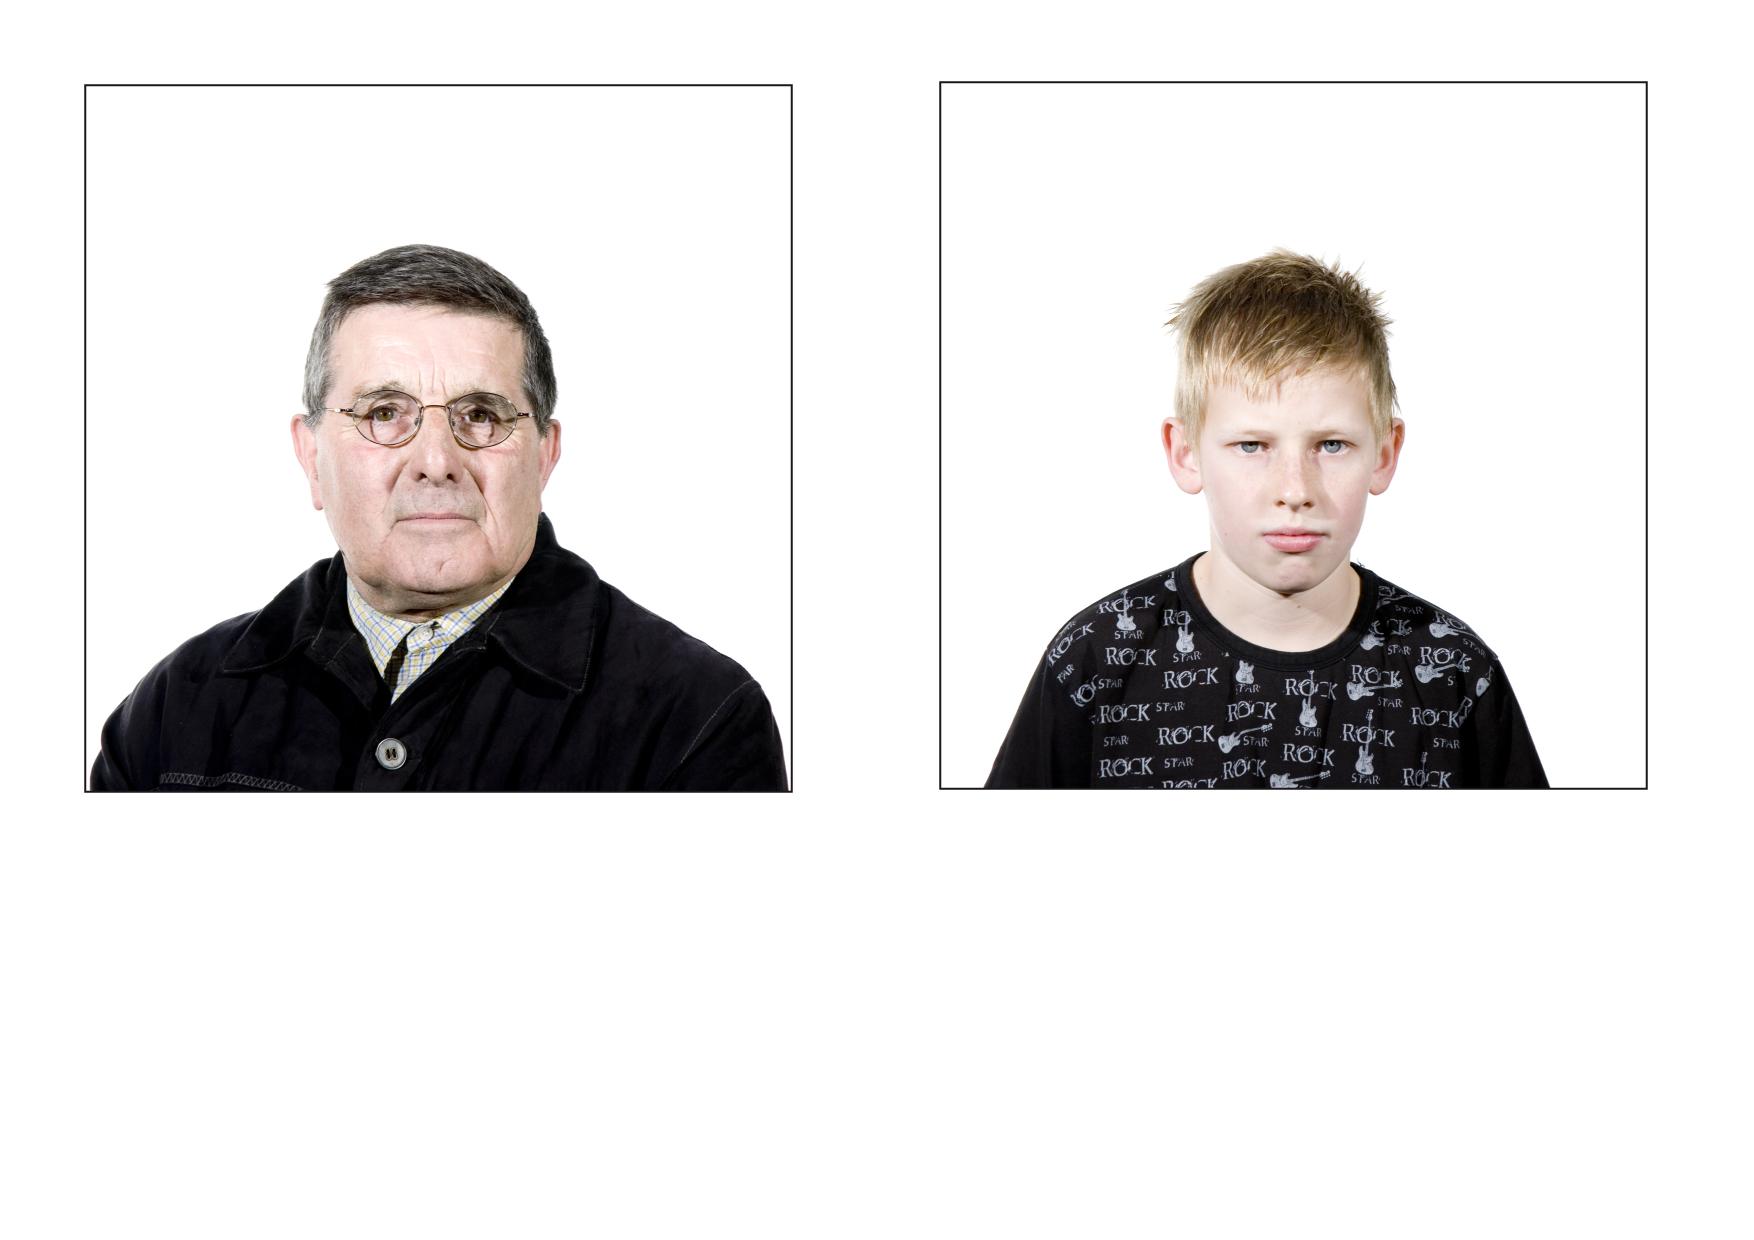 portraits-1-p6-7.jpg